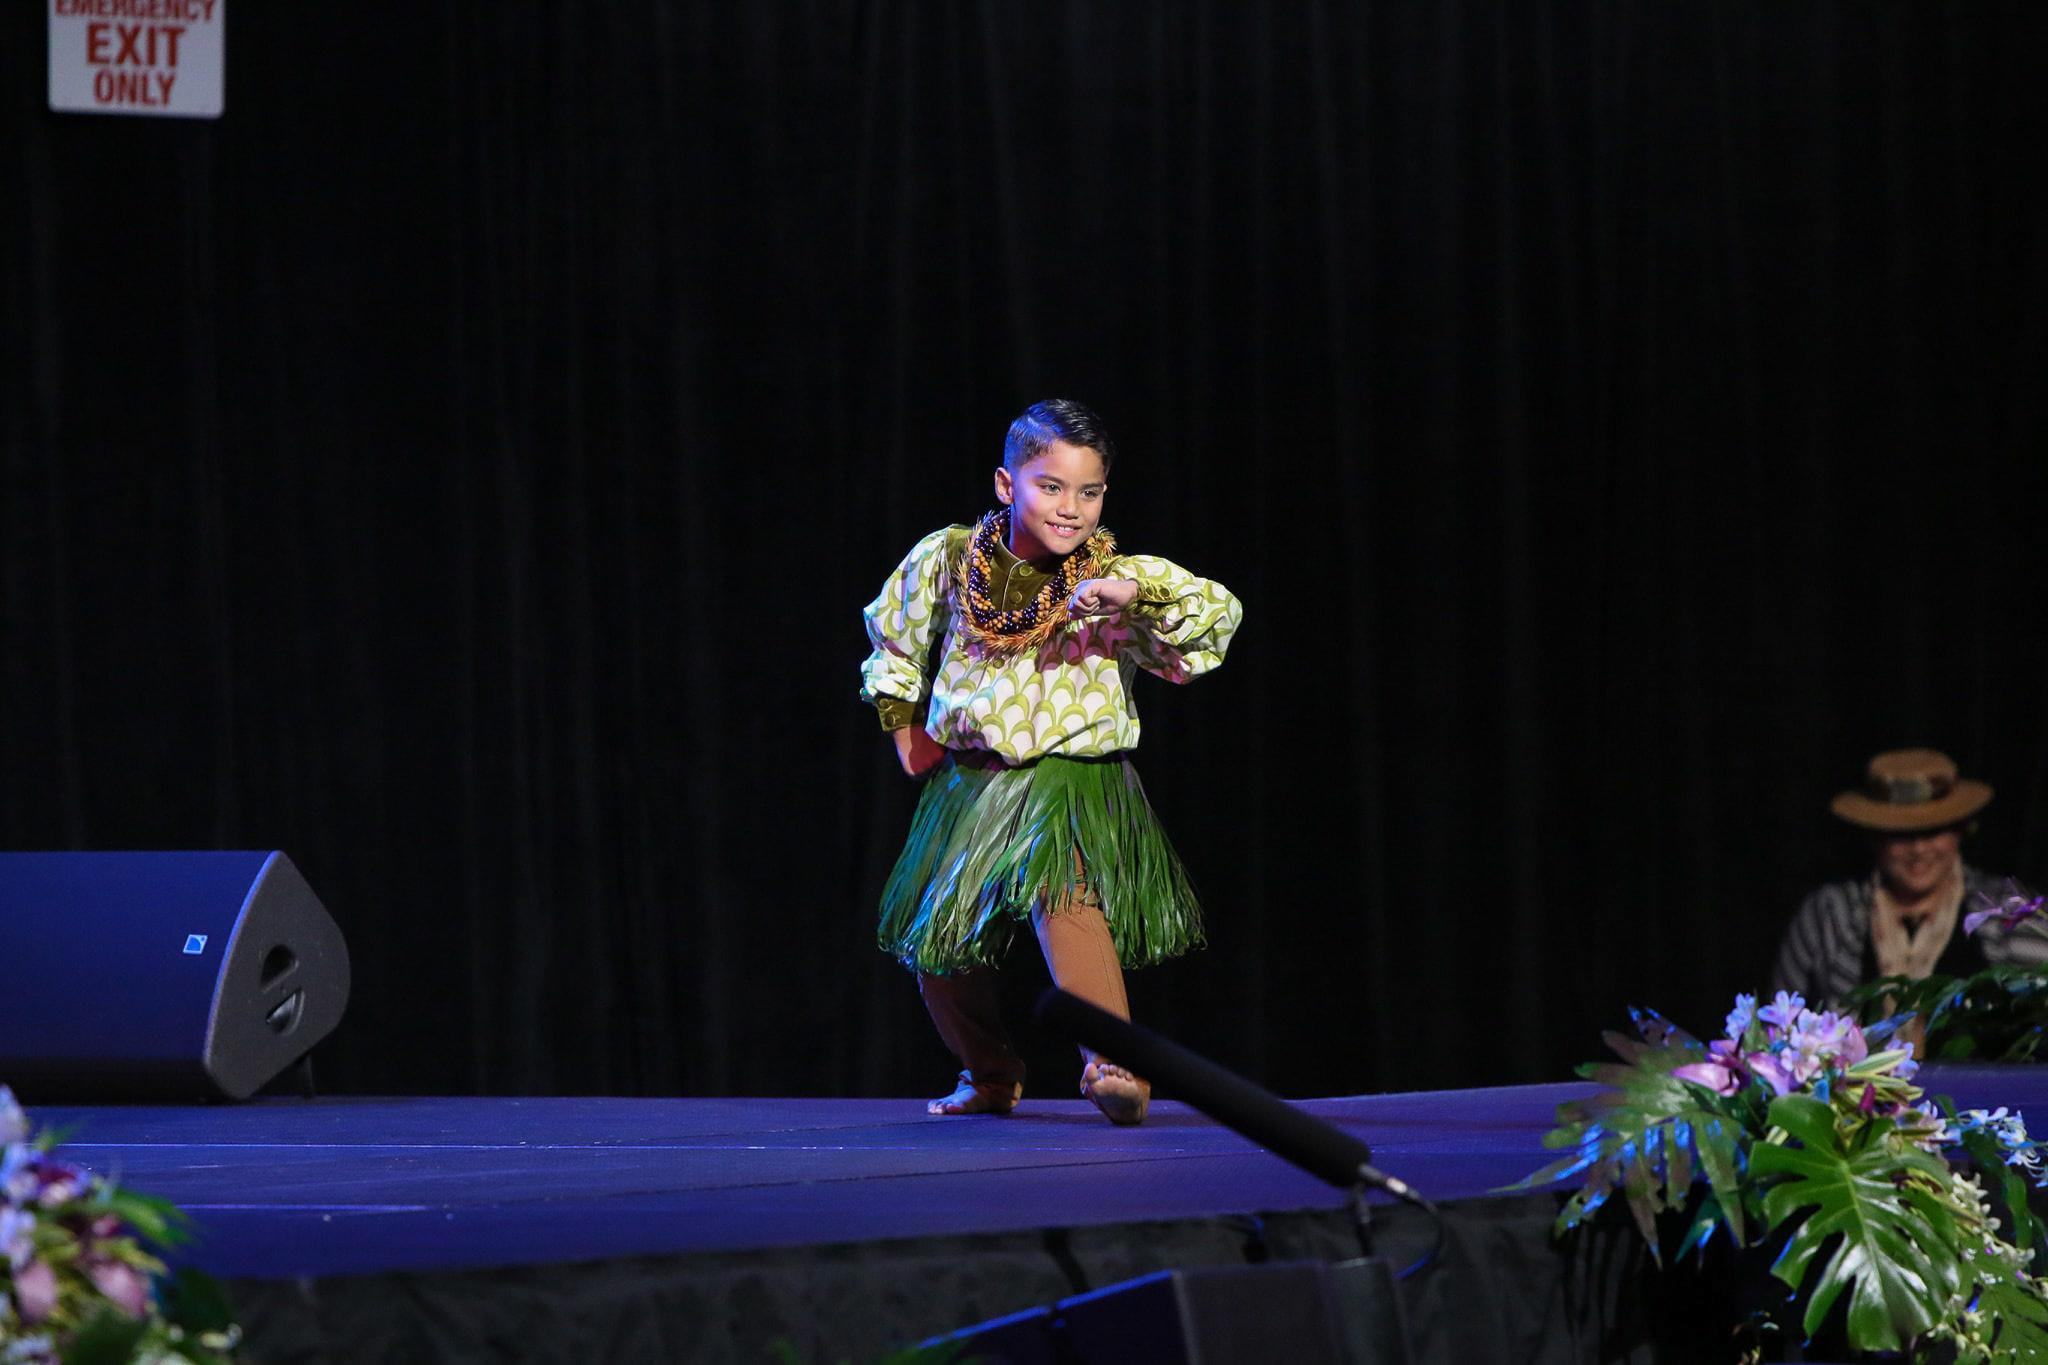 2018   5th place master keiki hula   enaahi dalire